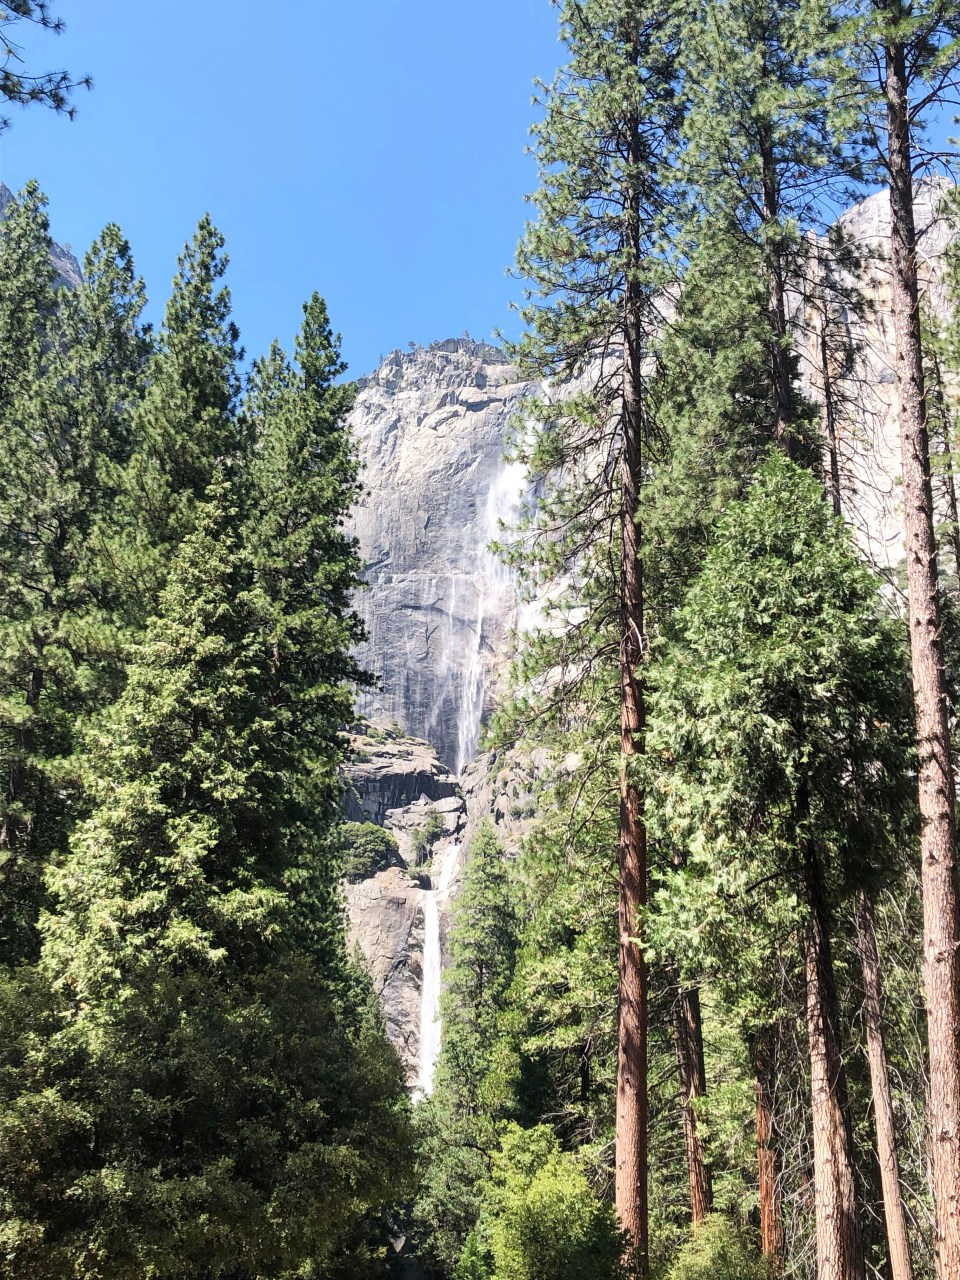 Yosemite National Park - Yosemite Falls